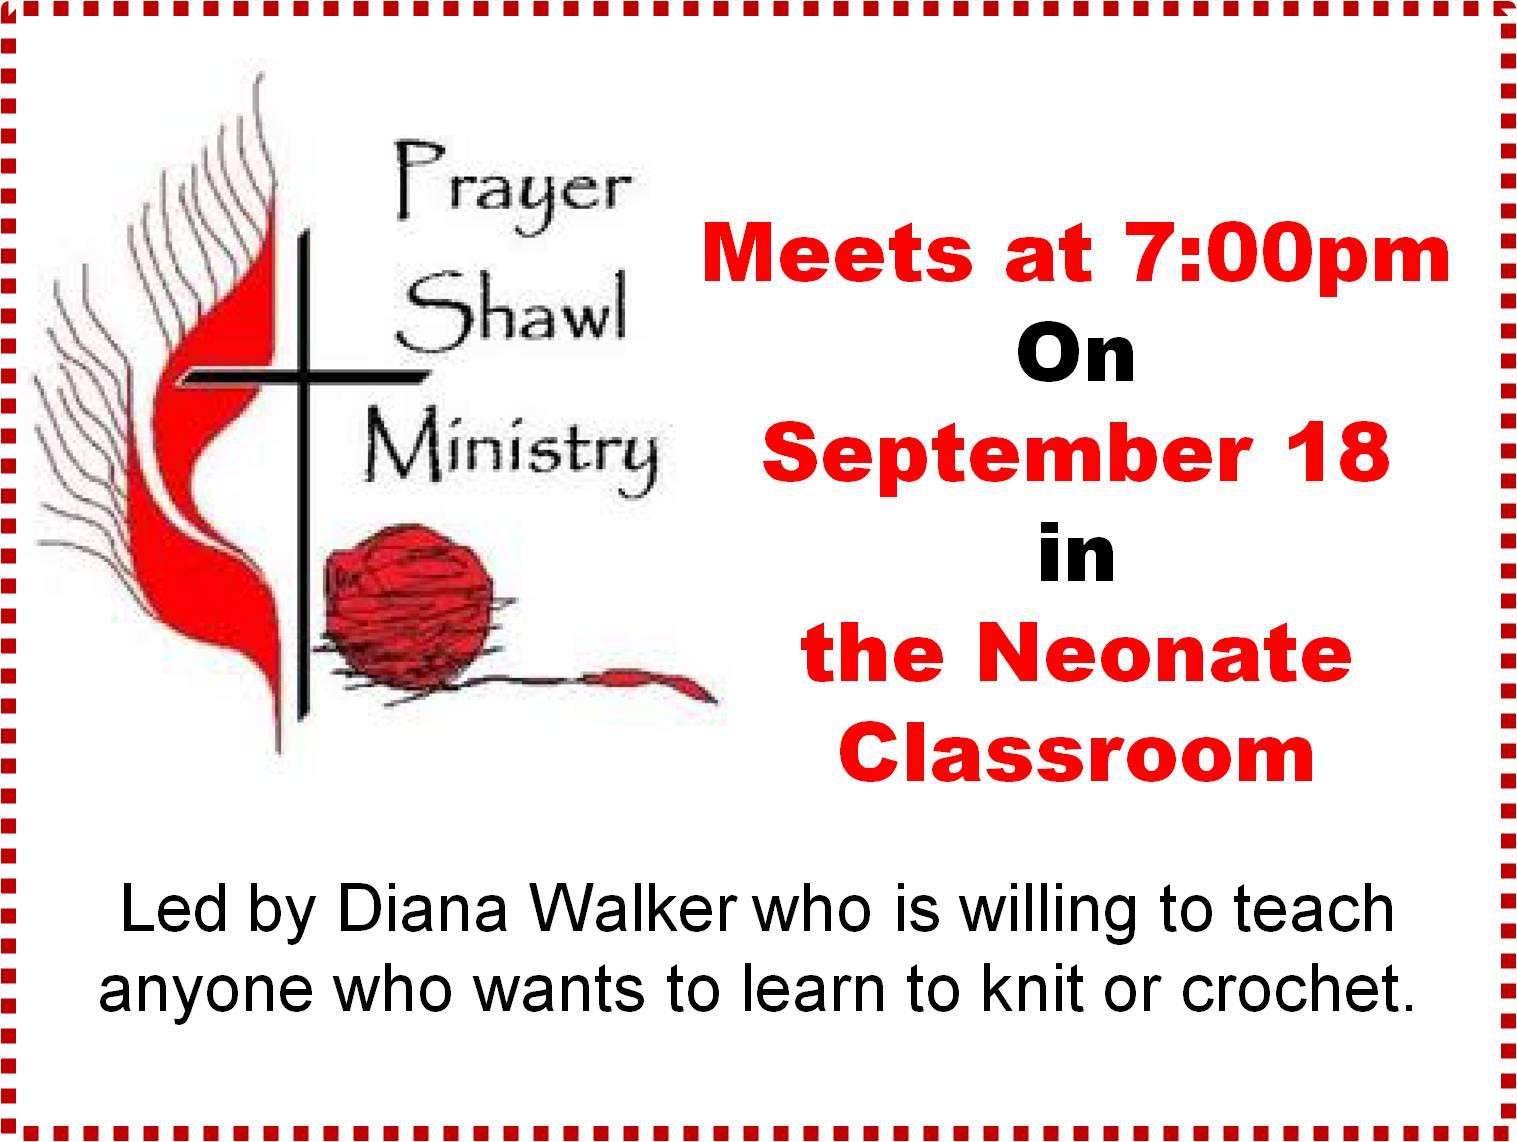 prayer shawl ministry